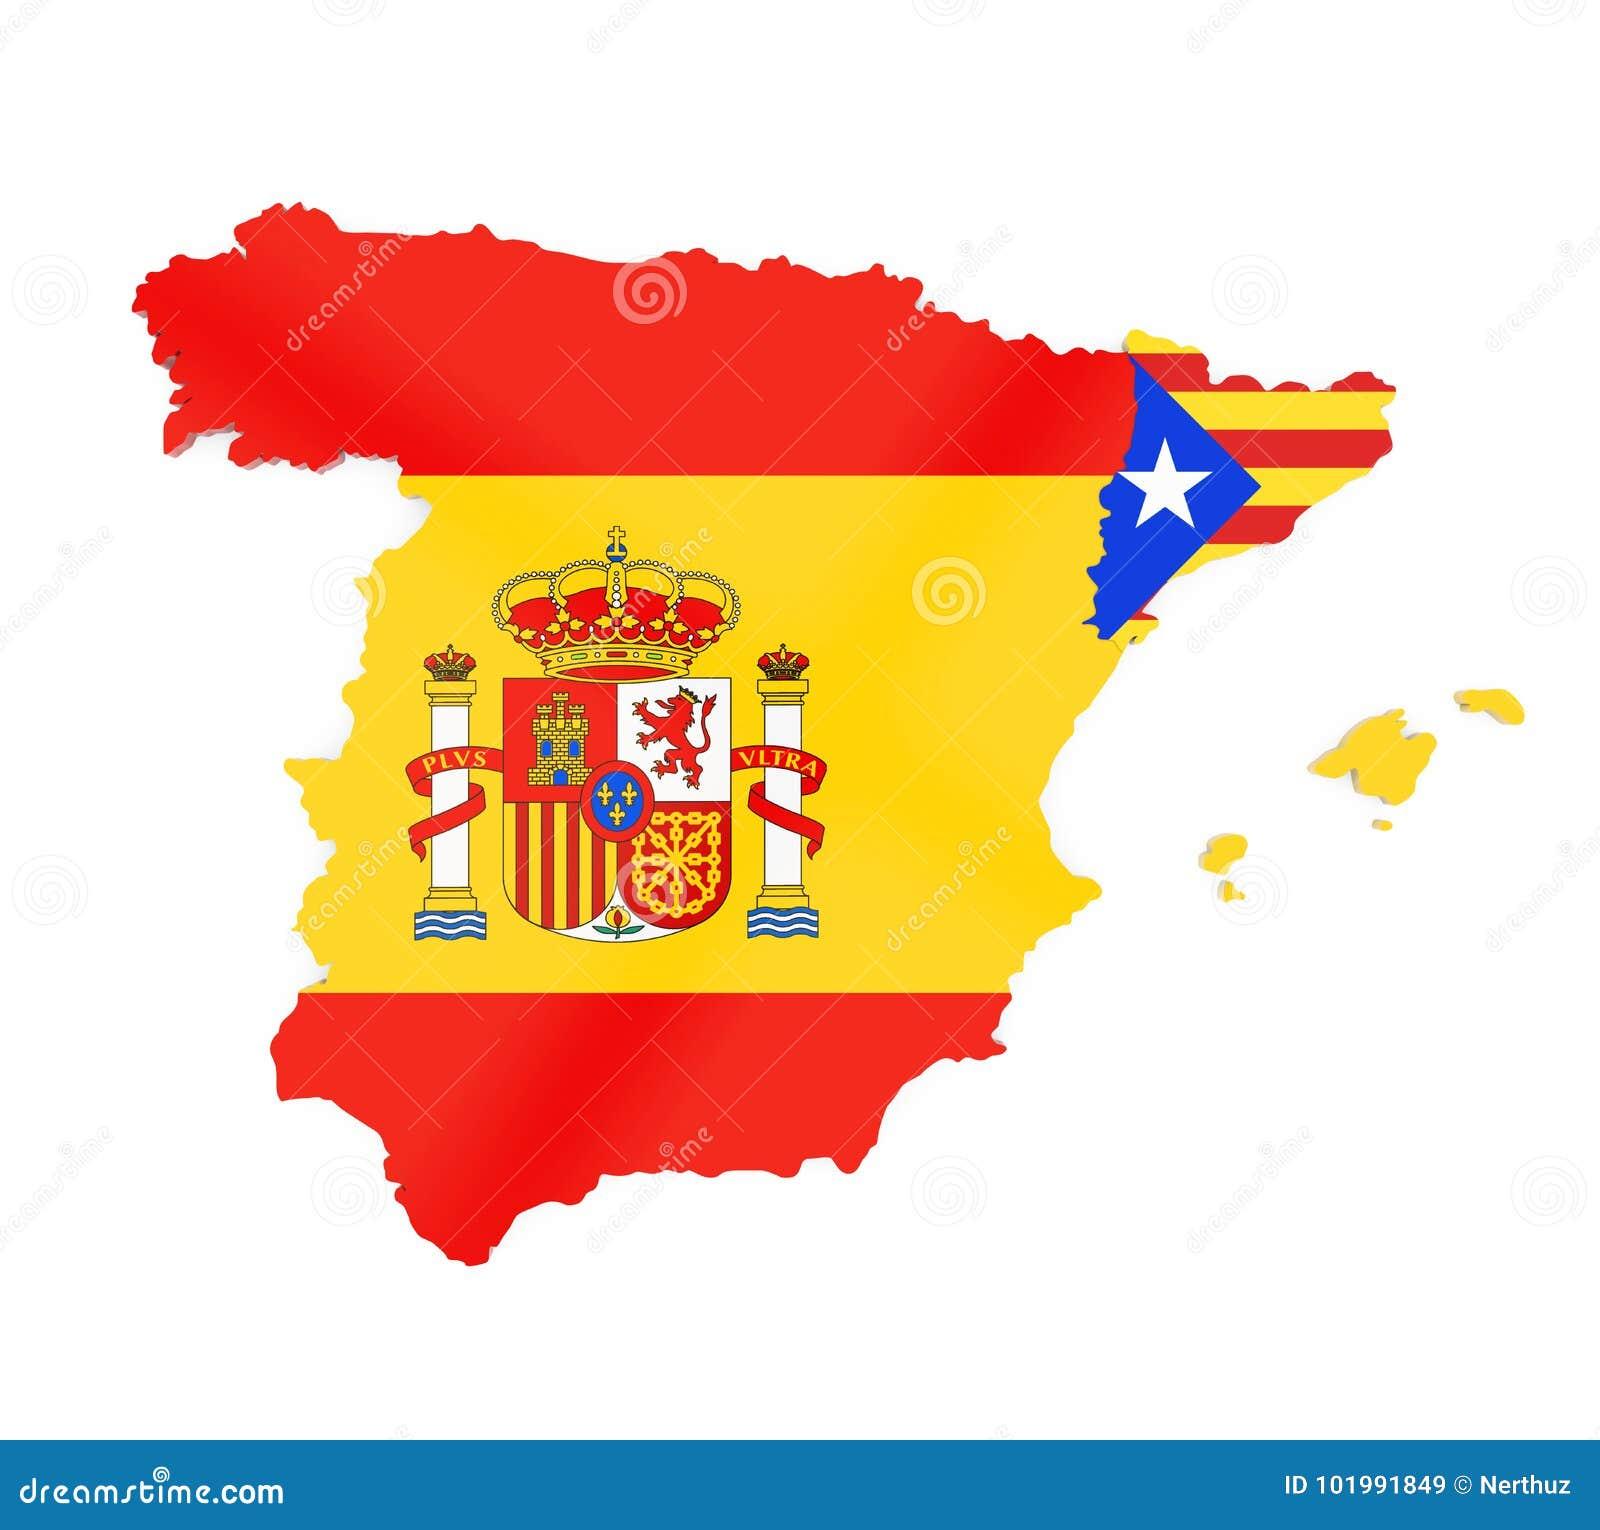 Catalunya Spain Map.Spain And Catalonia Map Isolated Stock Illustration Illustration